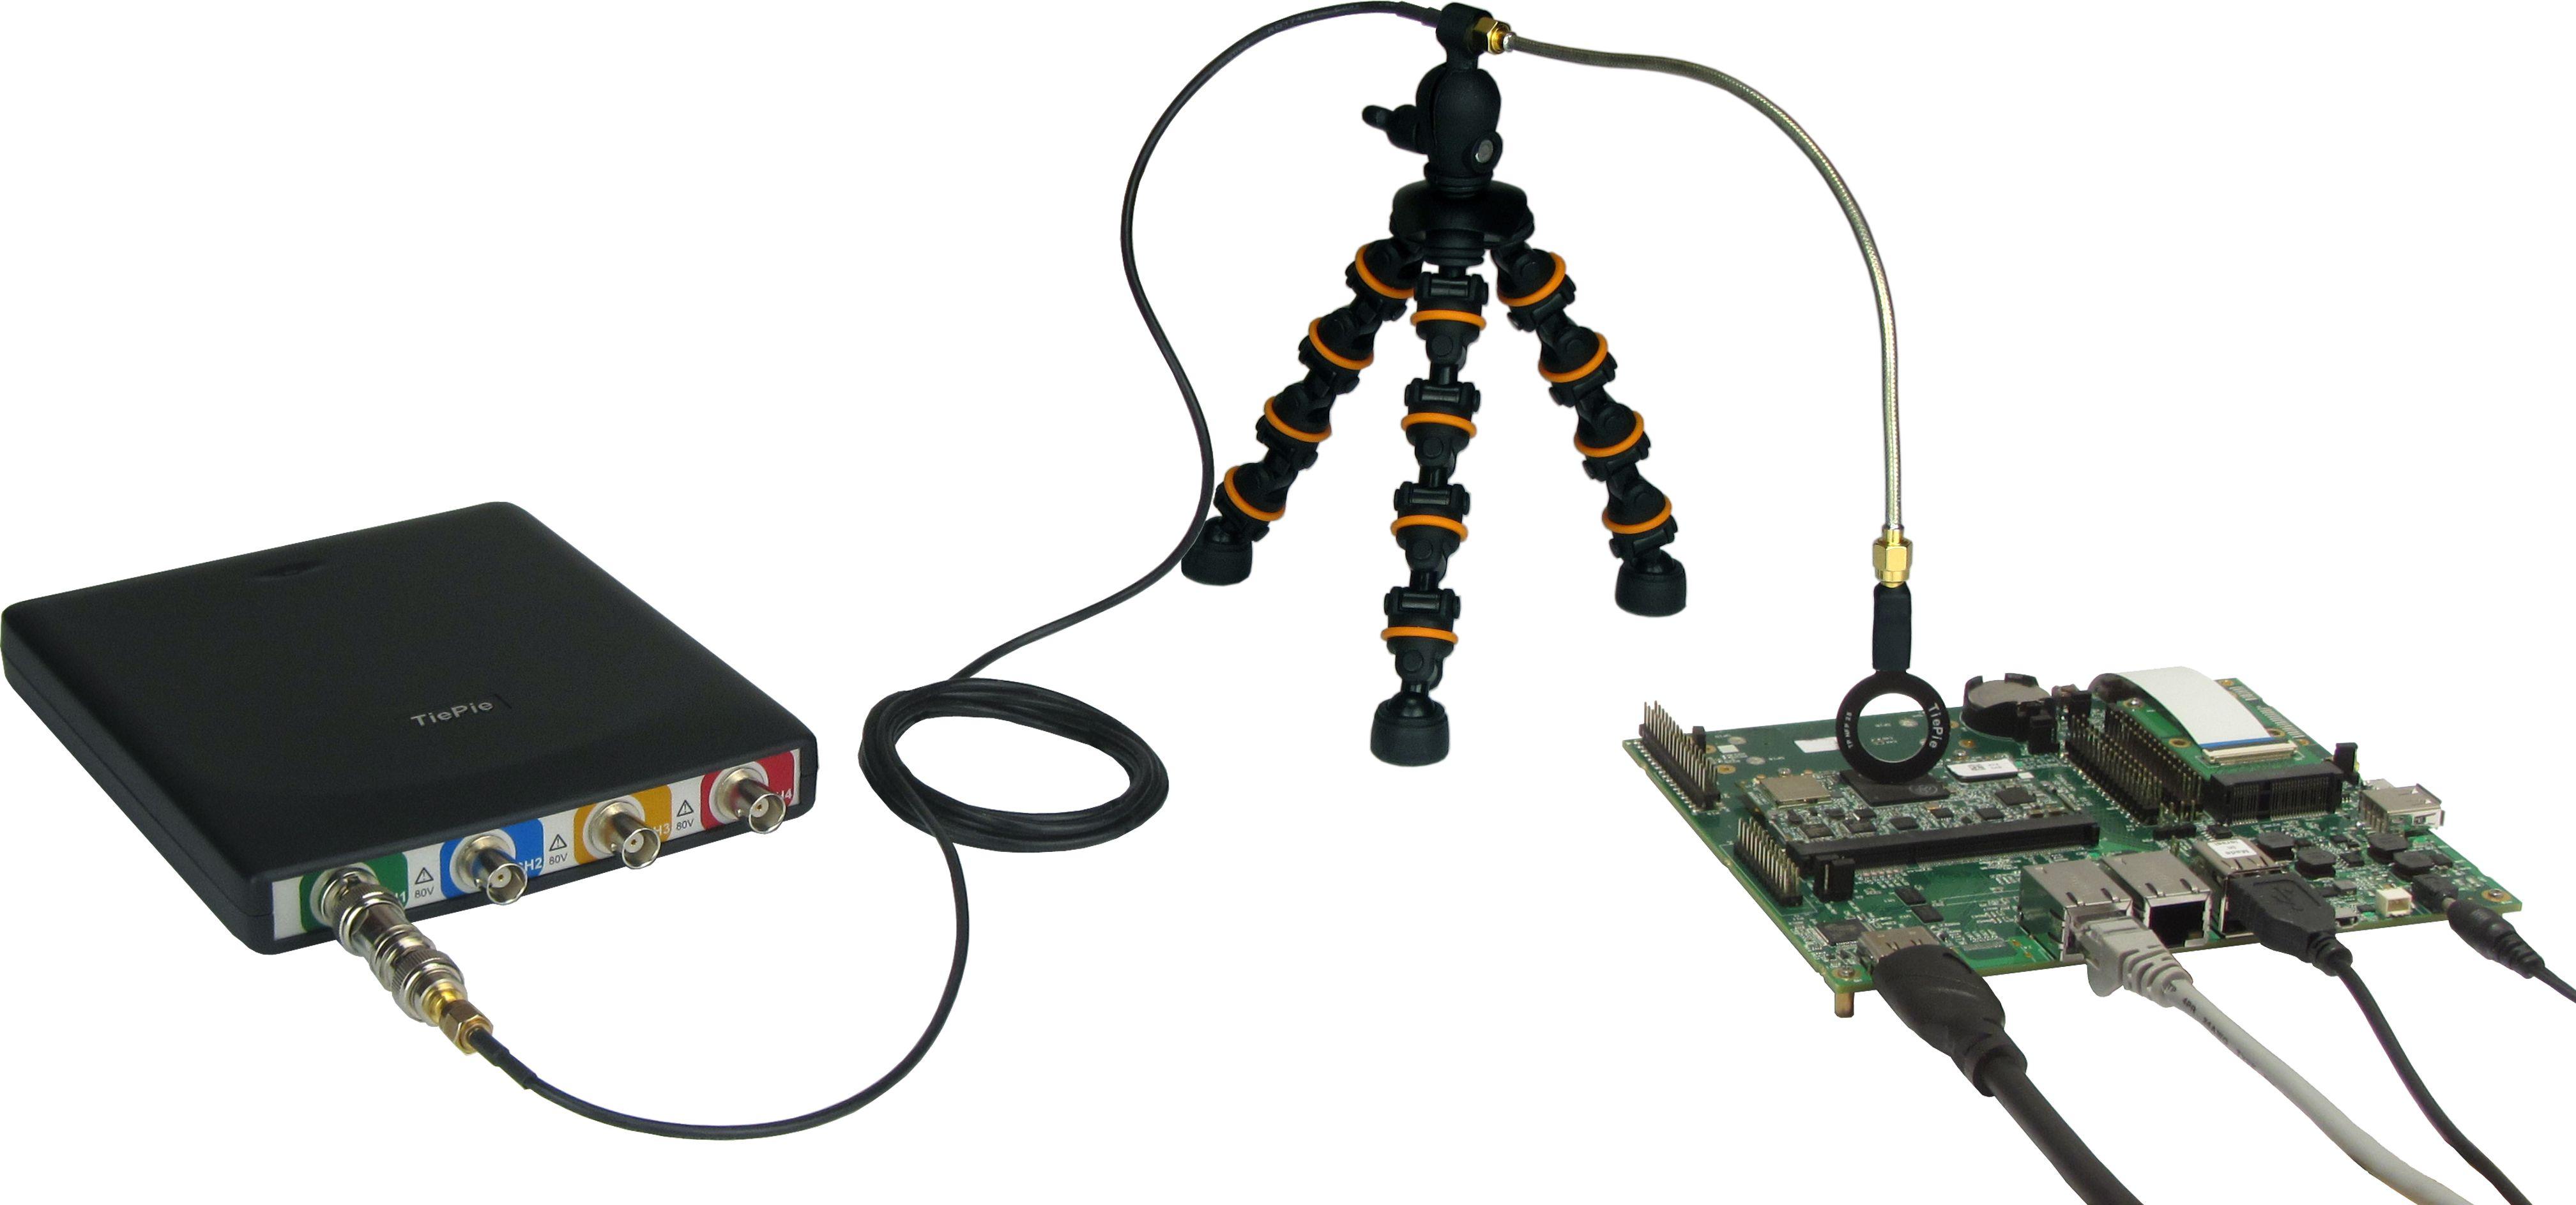 HandyscopeHS6 EMI setup